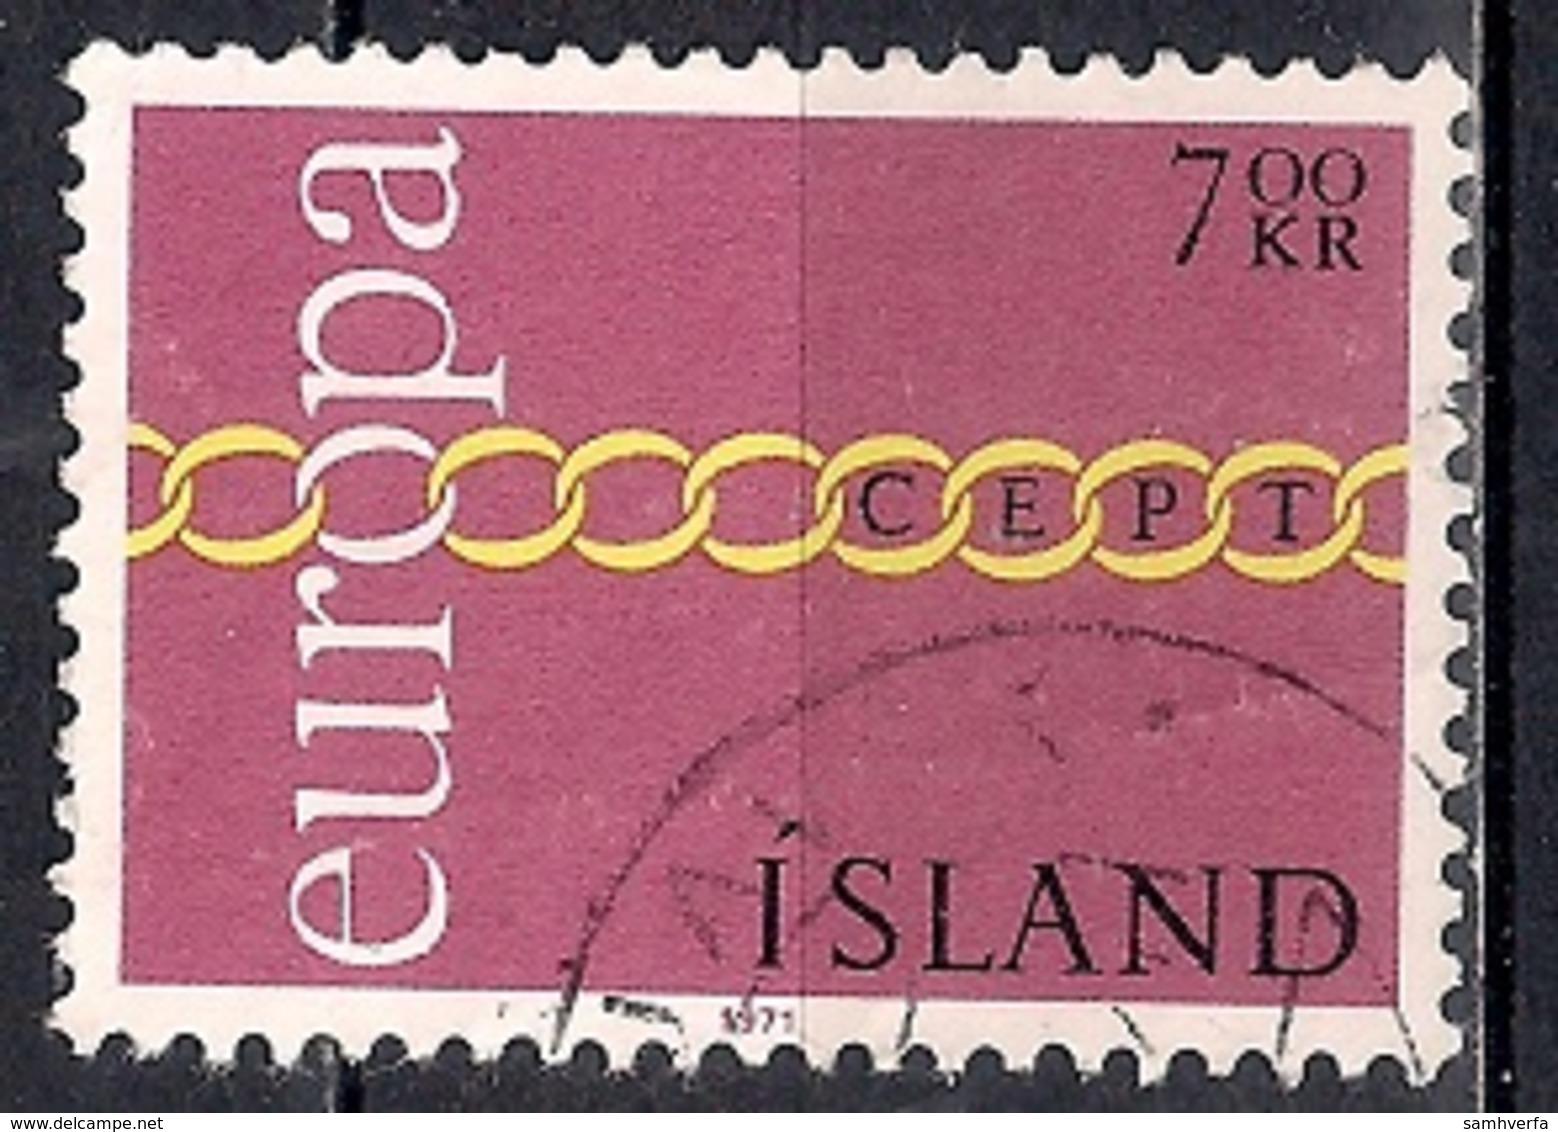 Iceland 1971 - EUROPA Stamps - 1944-... Republik